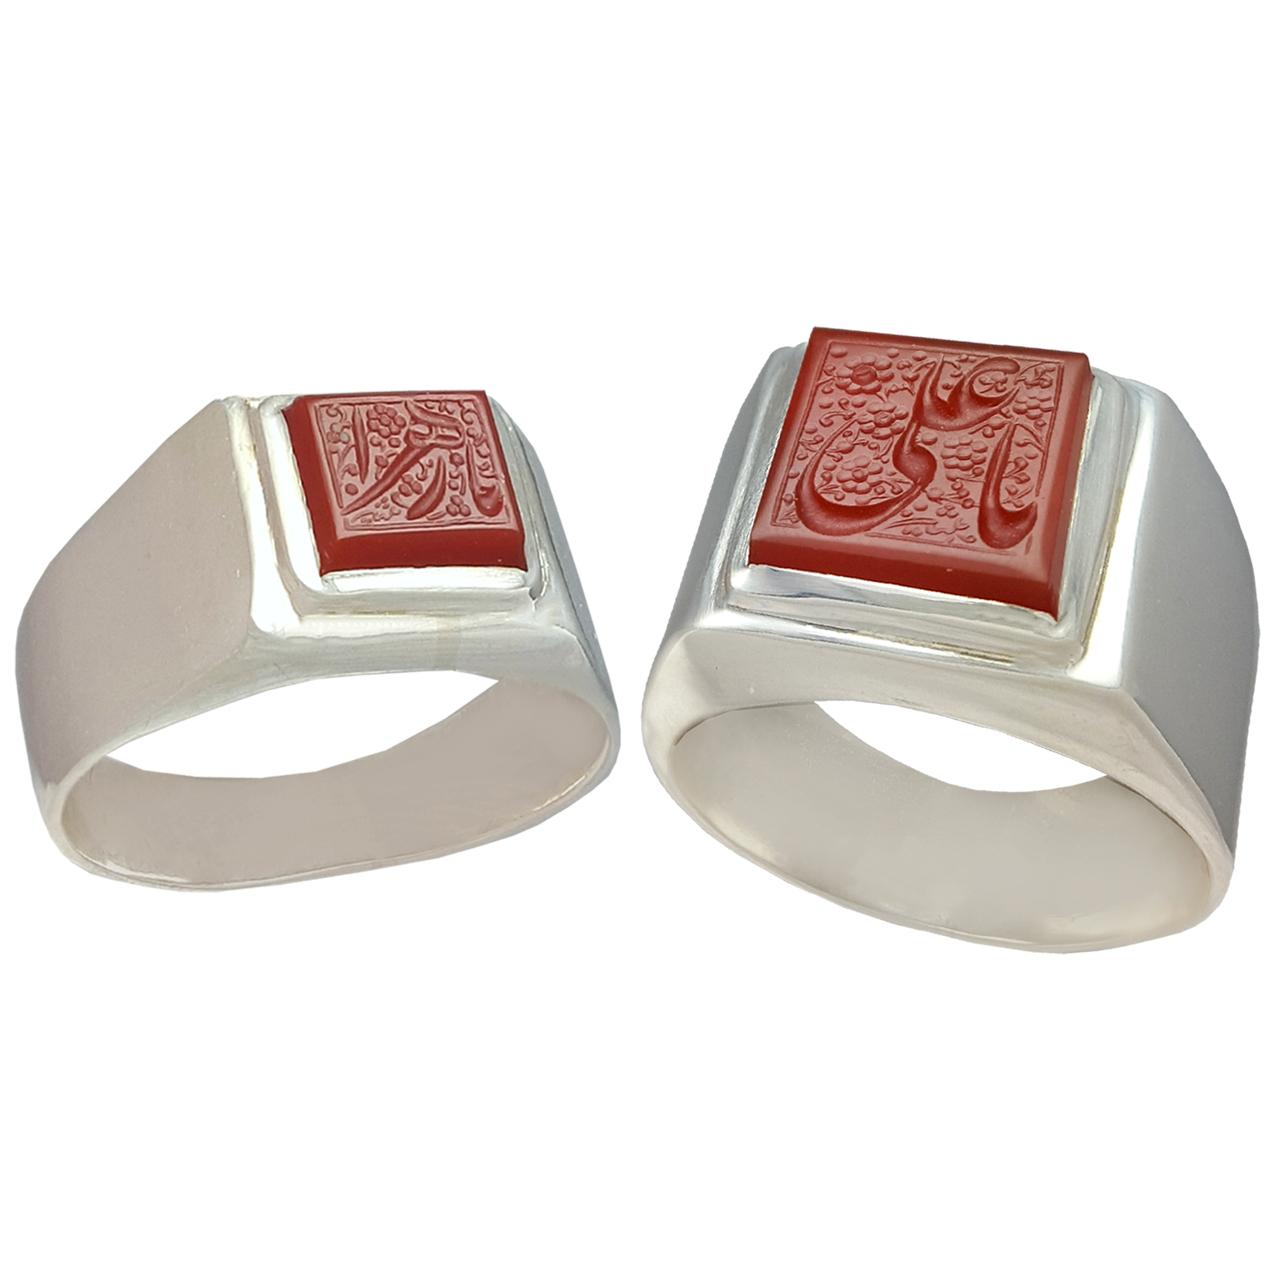 ست انگشتر نقره زنانه و مردانه کد a571jw